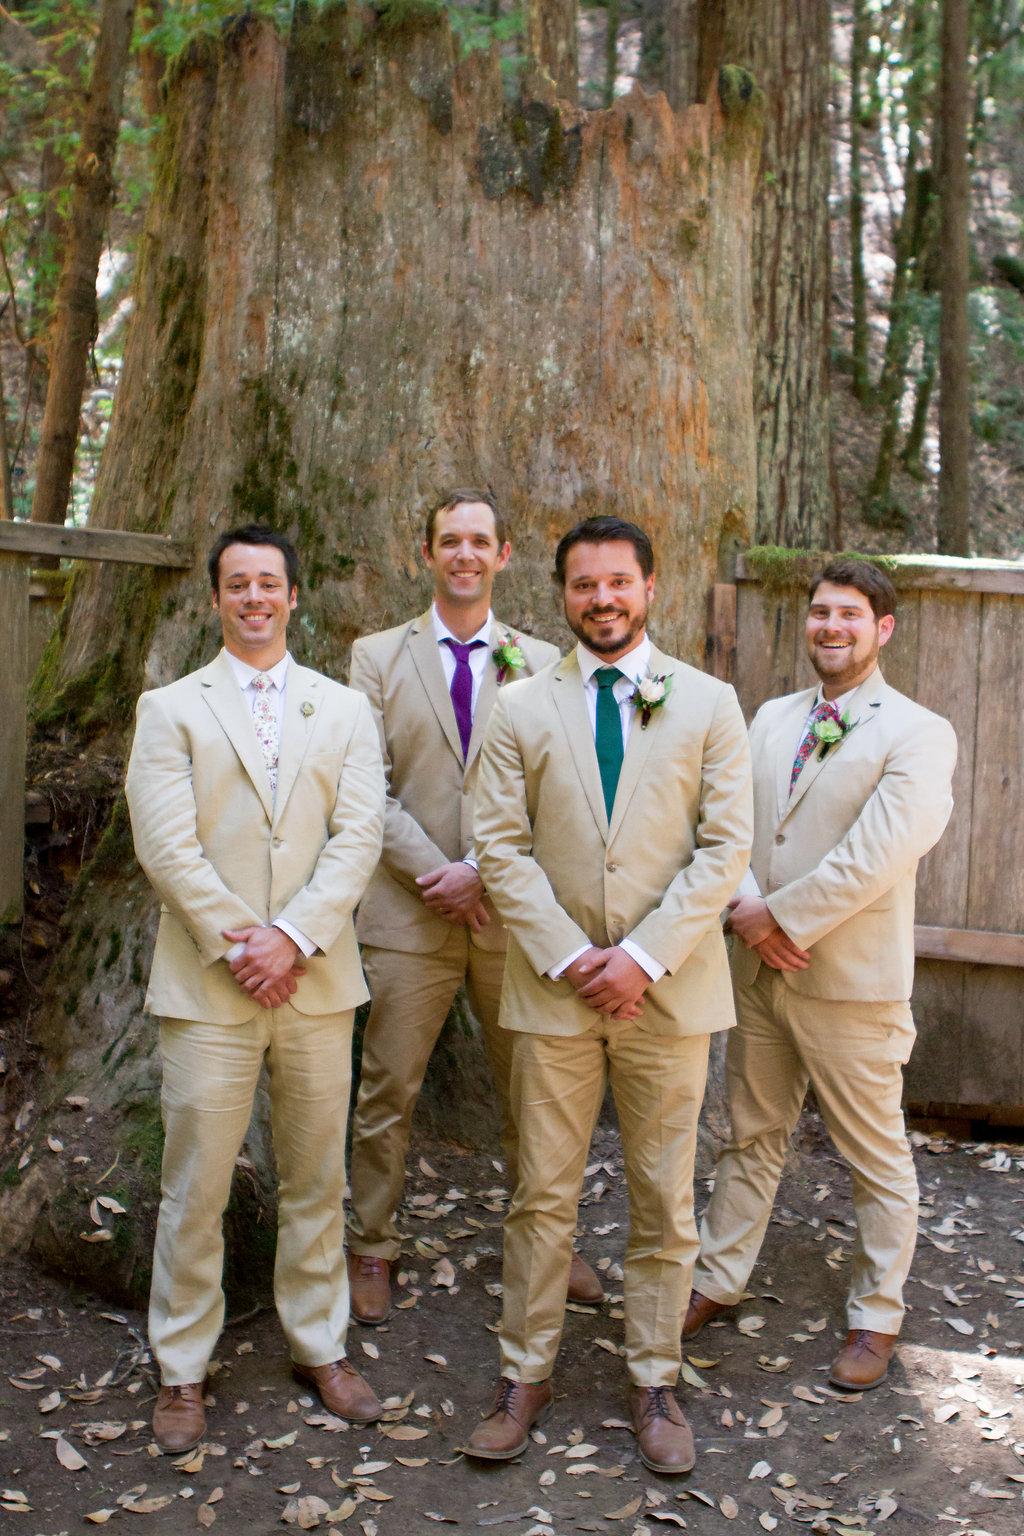 lillich-manogue-wedding-1157.jpg